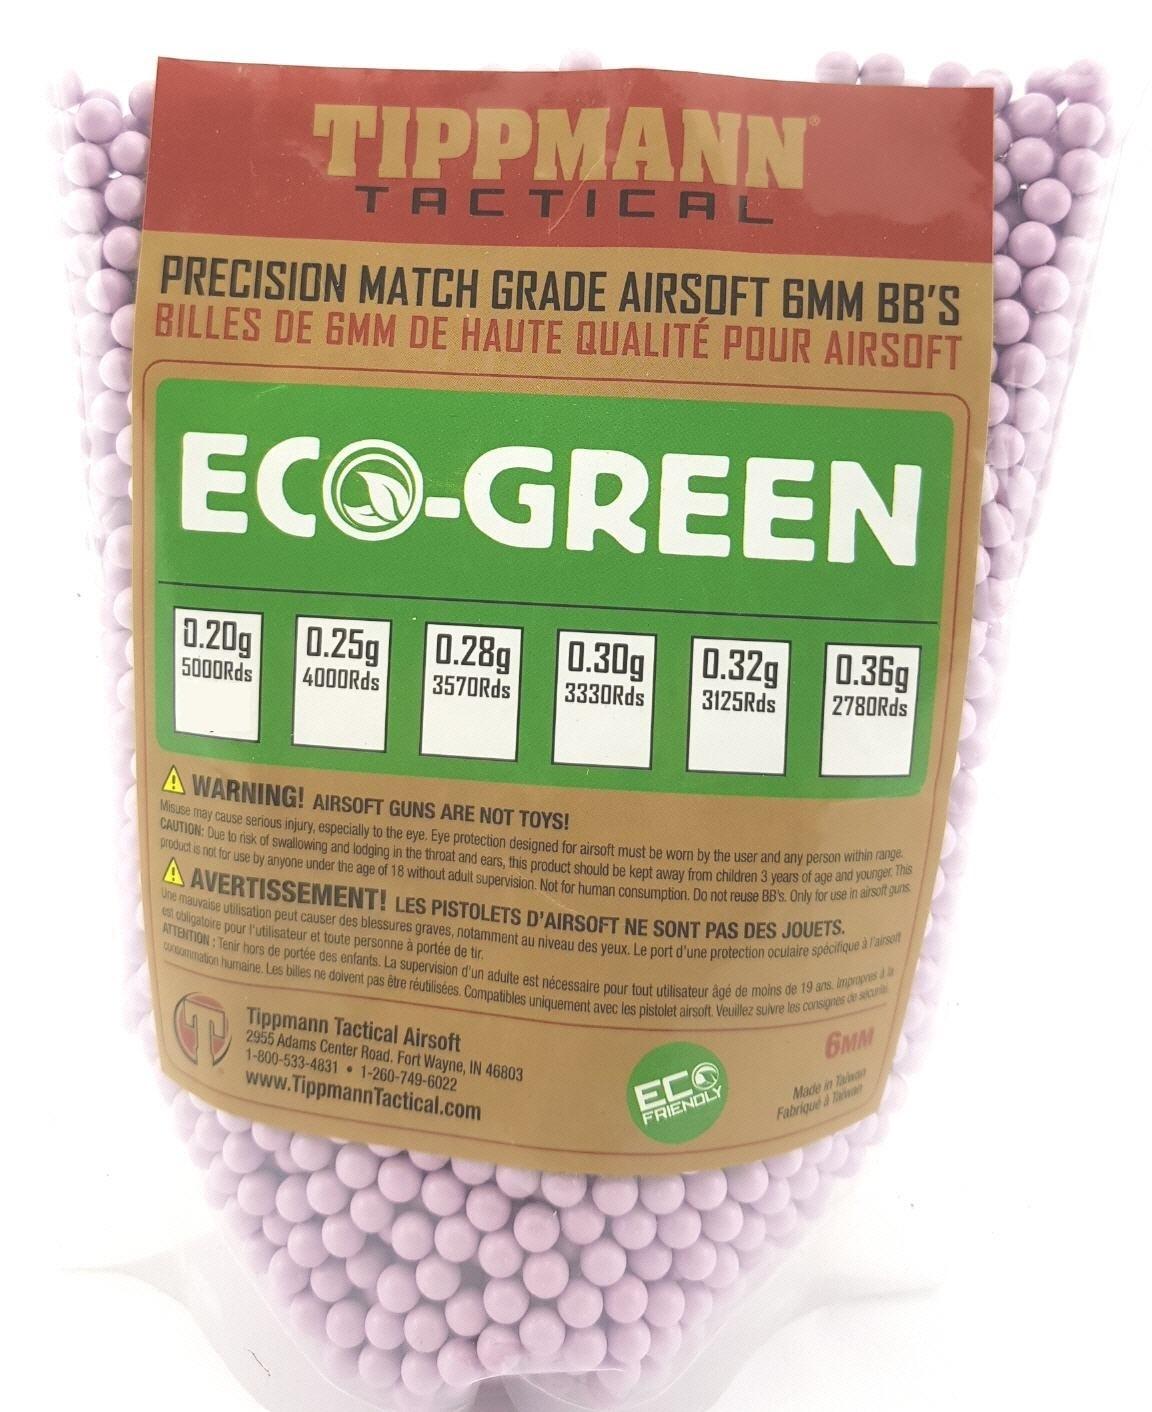 Tippmann Tippmann 0.28g - 3570 bio bb's - purple